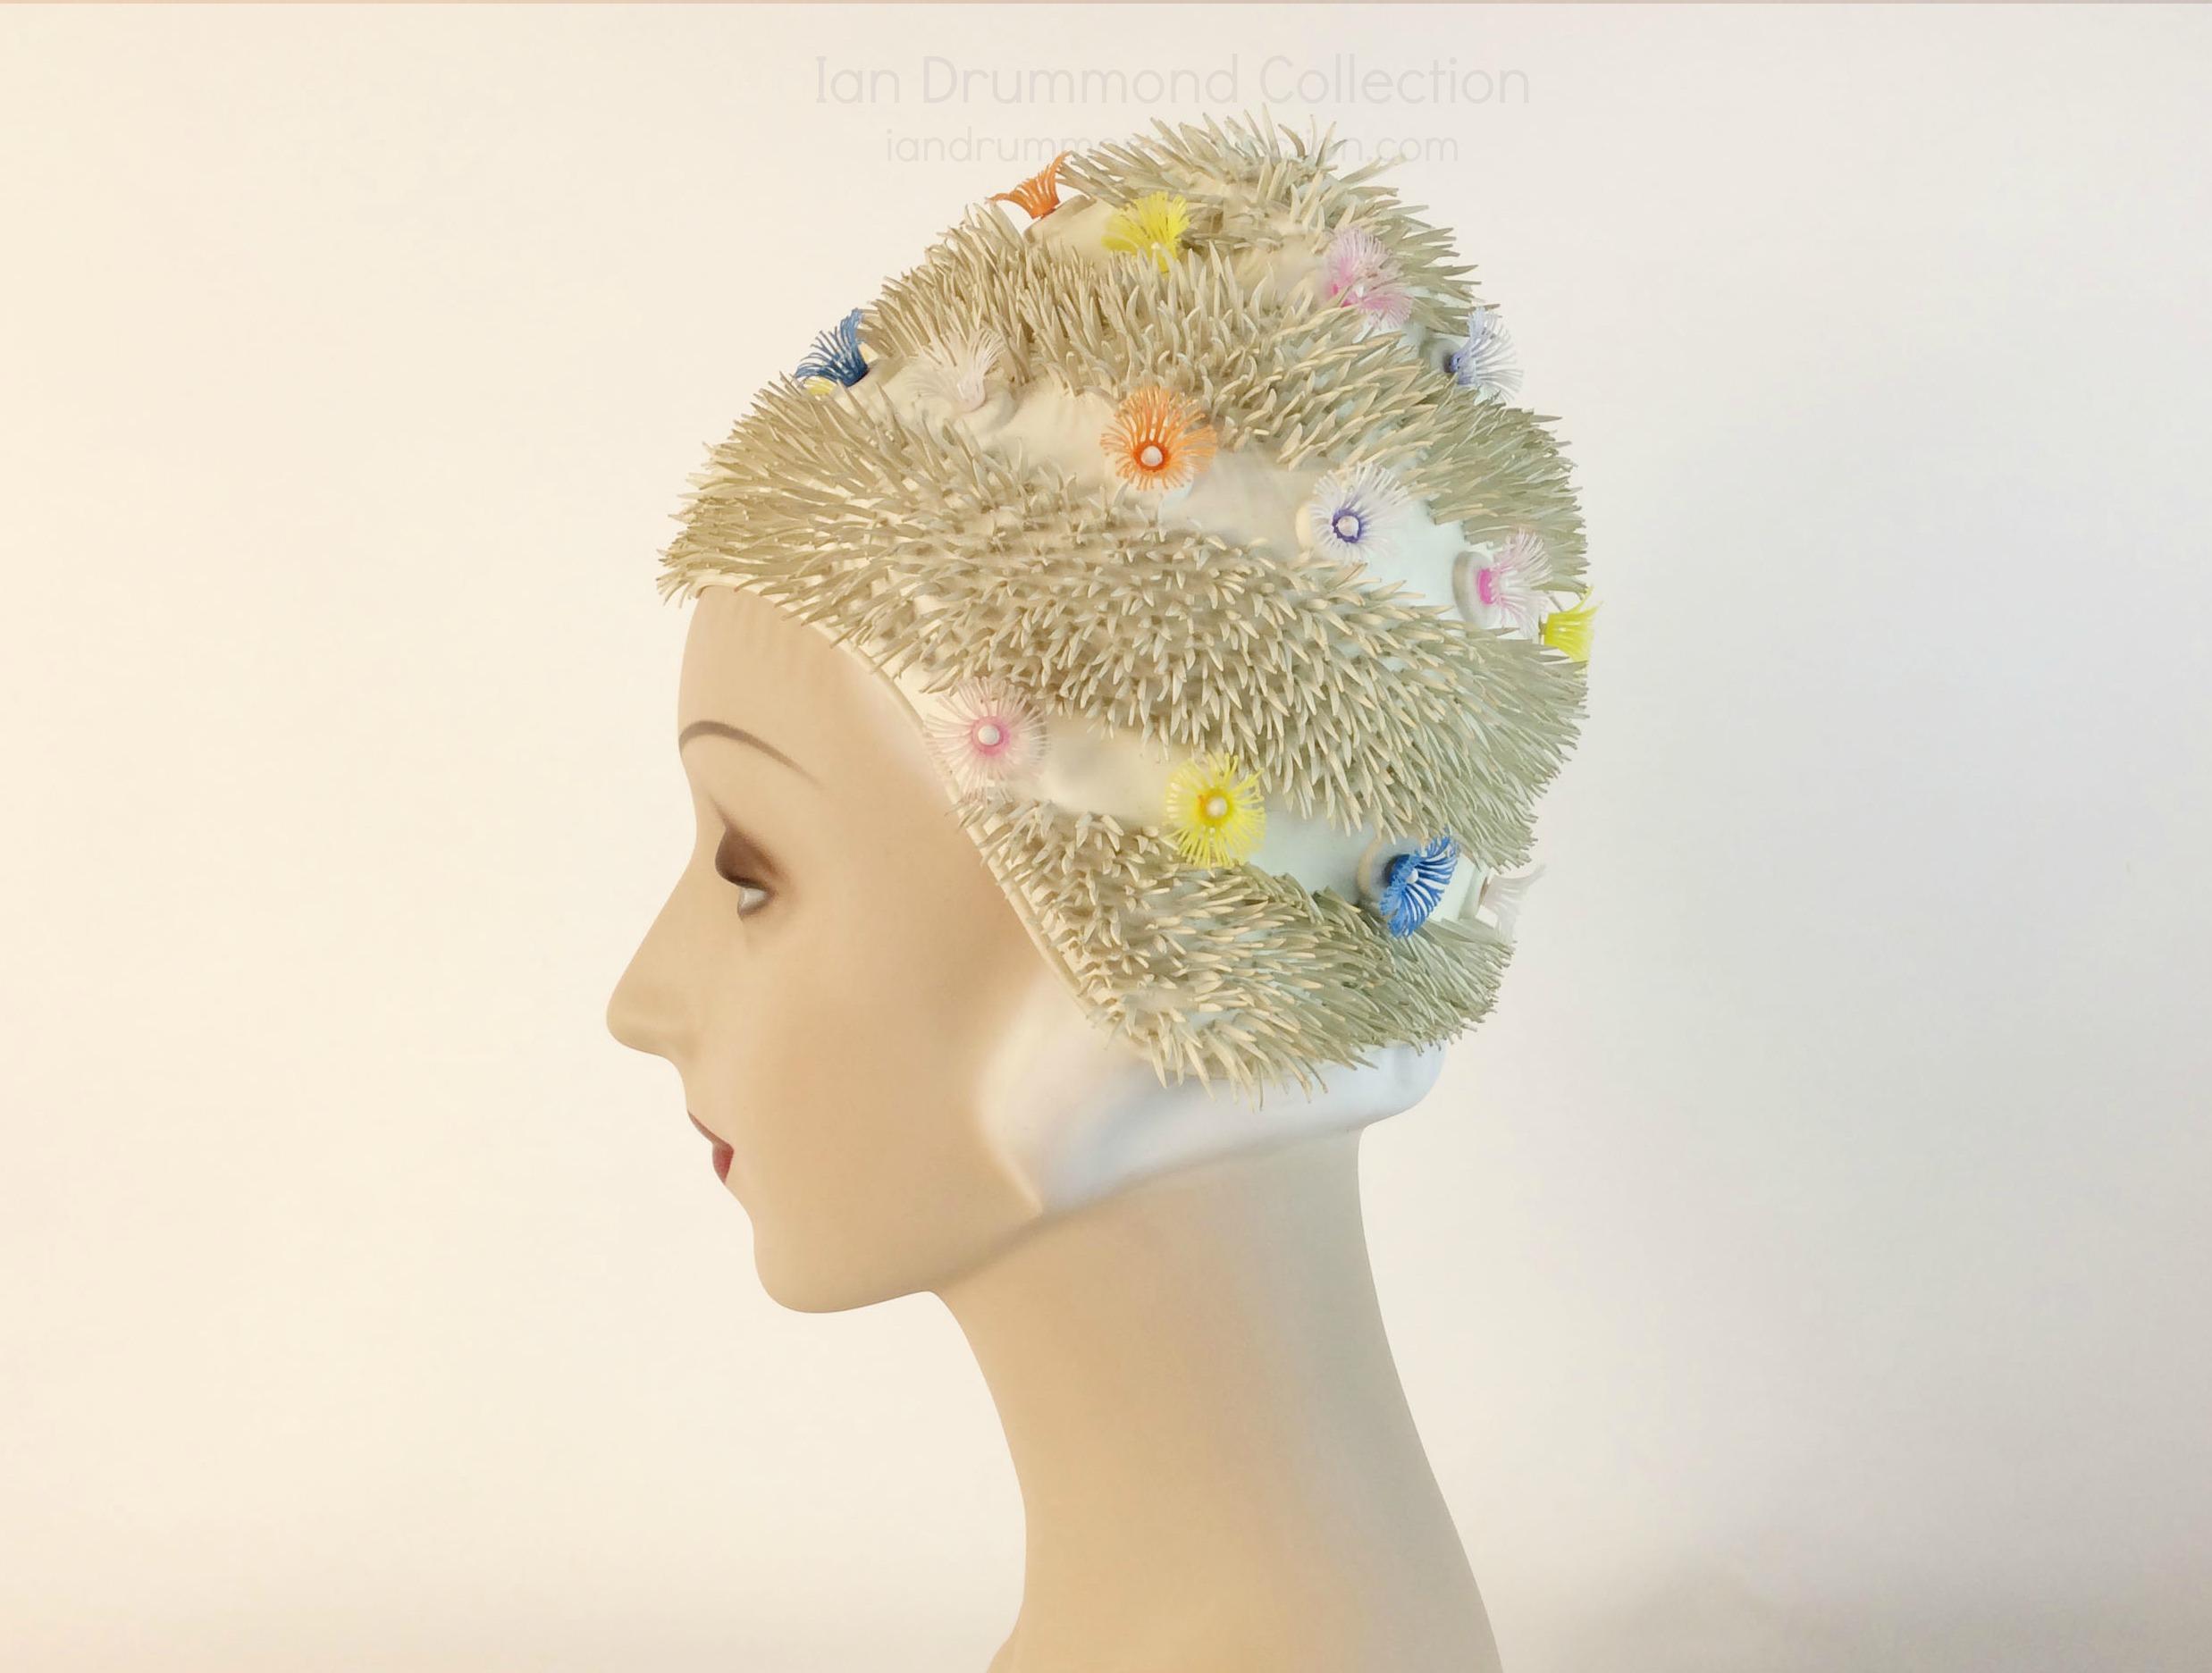 IDC Movie Wardrobe Rental Swim Cap 7 Cream with Spikes and Multicolour Flowers